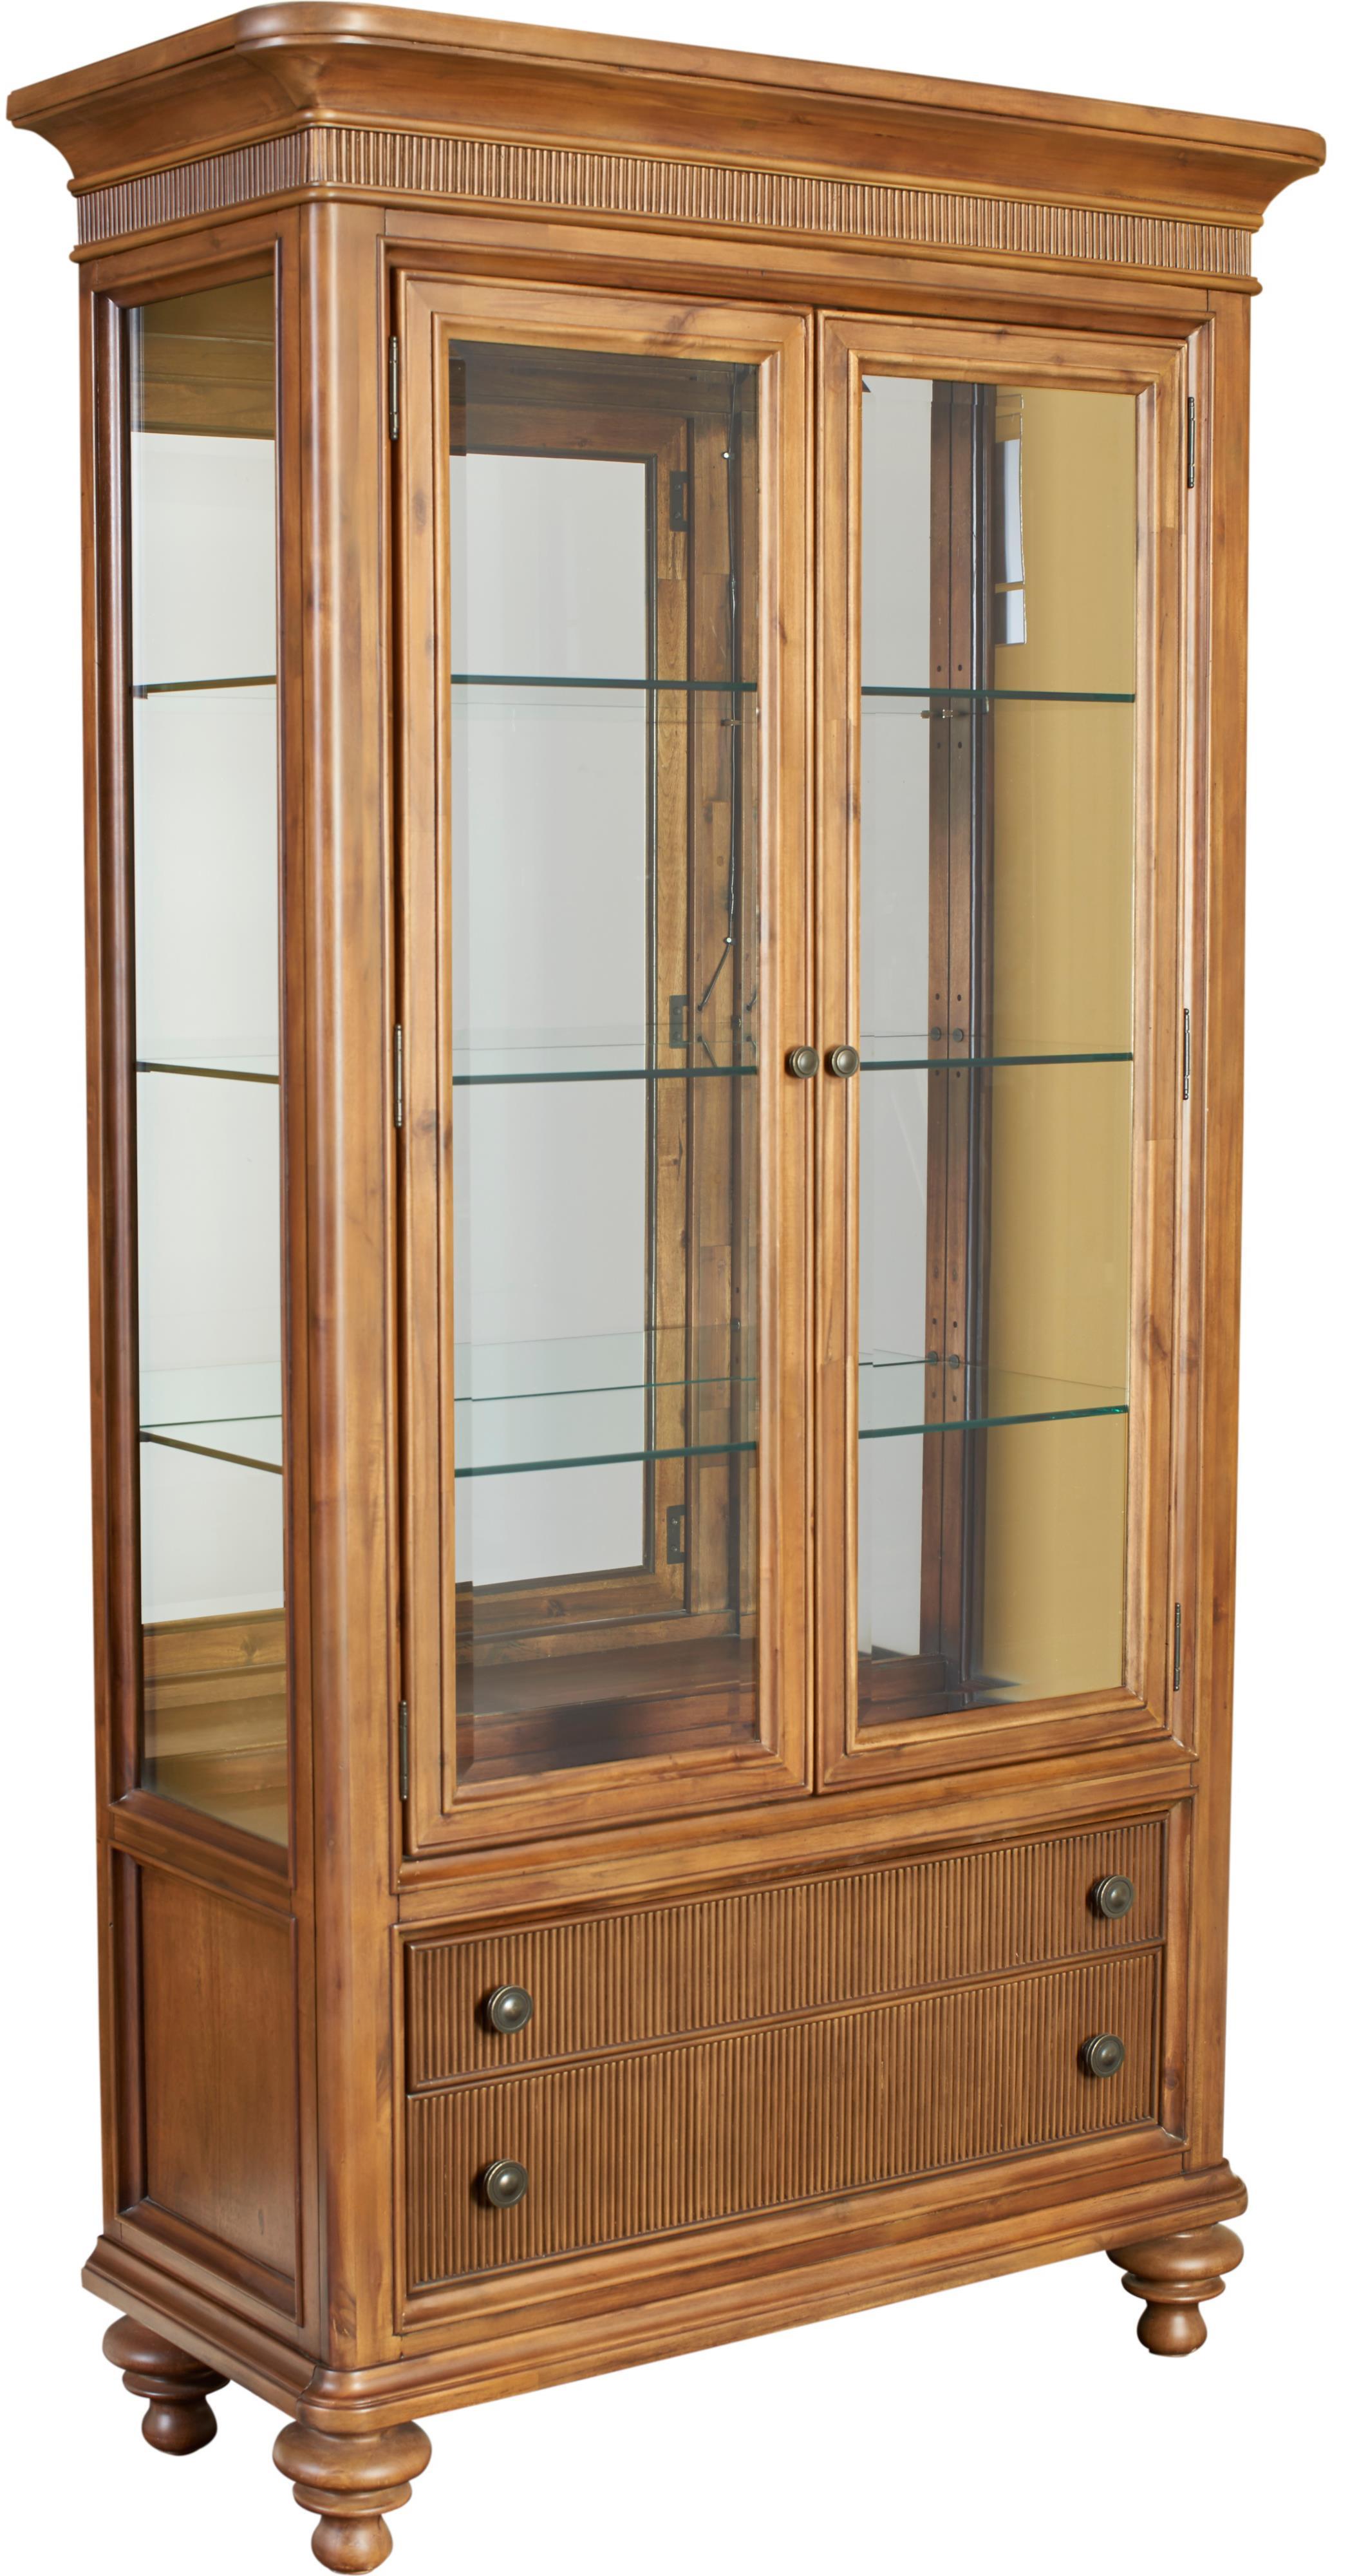 Broyhill Furniture Cascade Curio China - Item Number: 4940-560